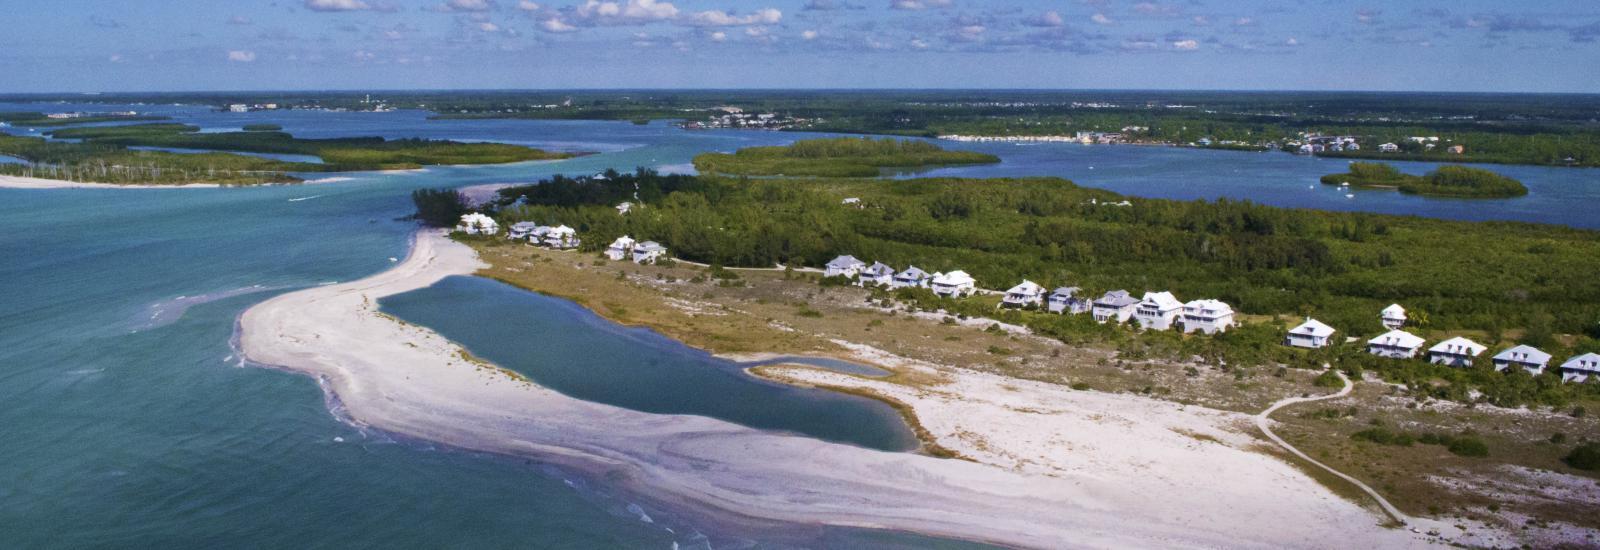 Aerial - Stump Pass & Palm Island Resort